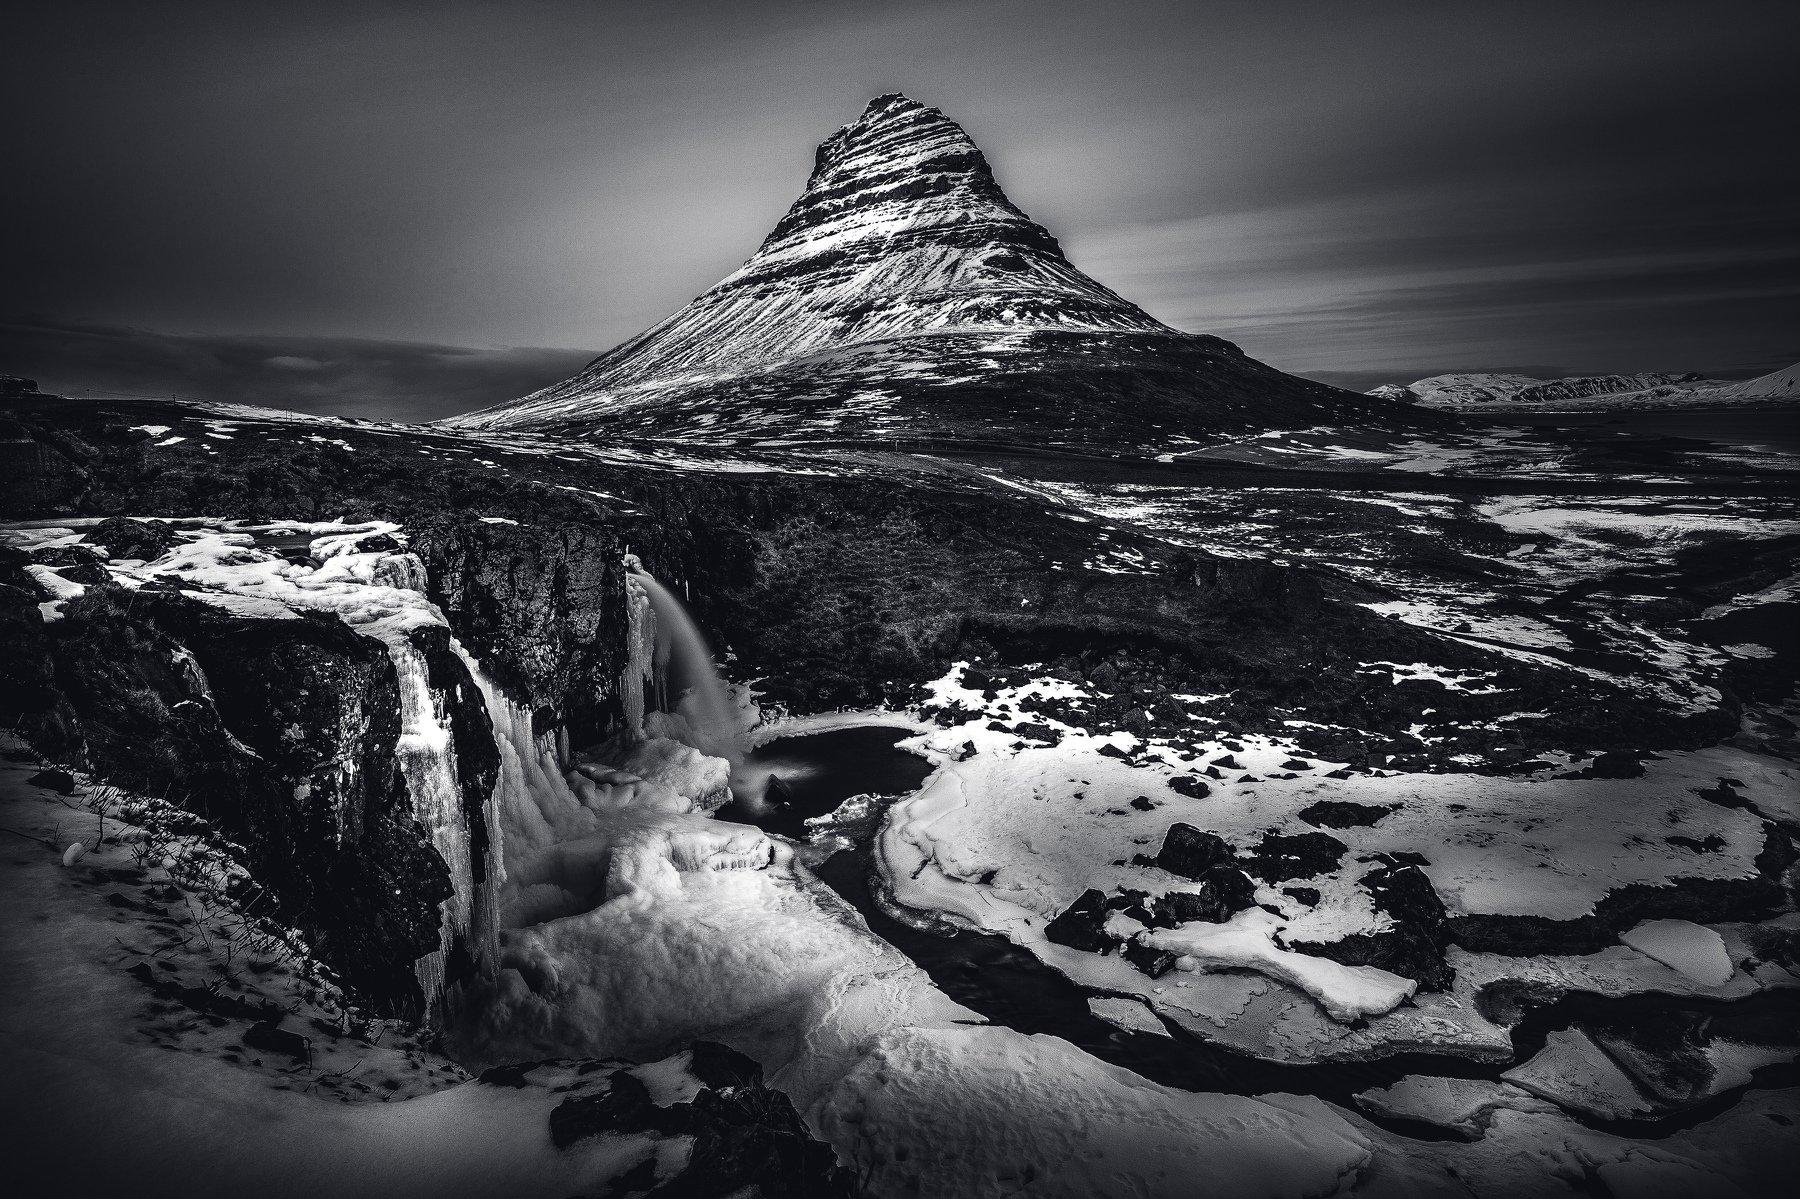 гора снег исландия, Александр Куренной